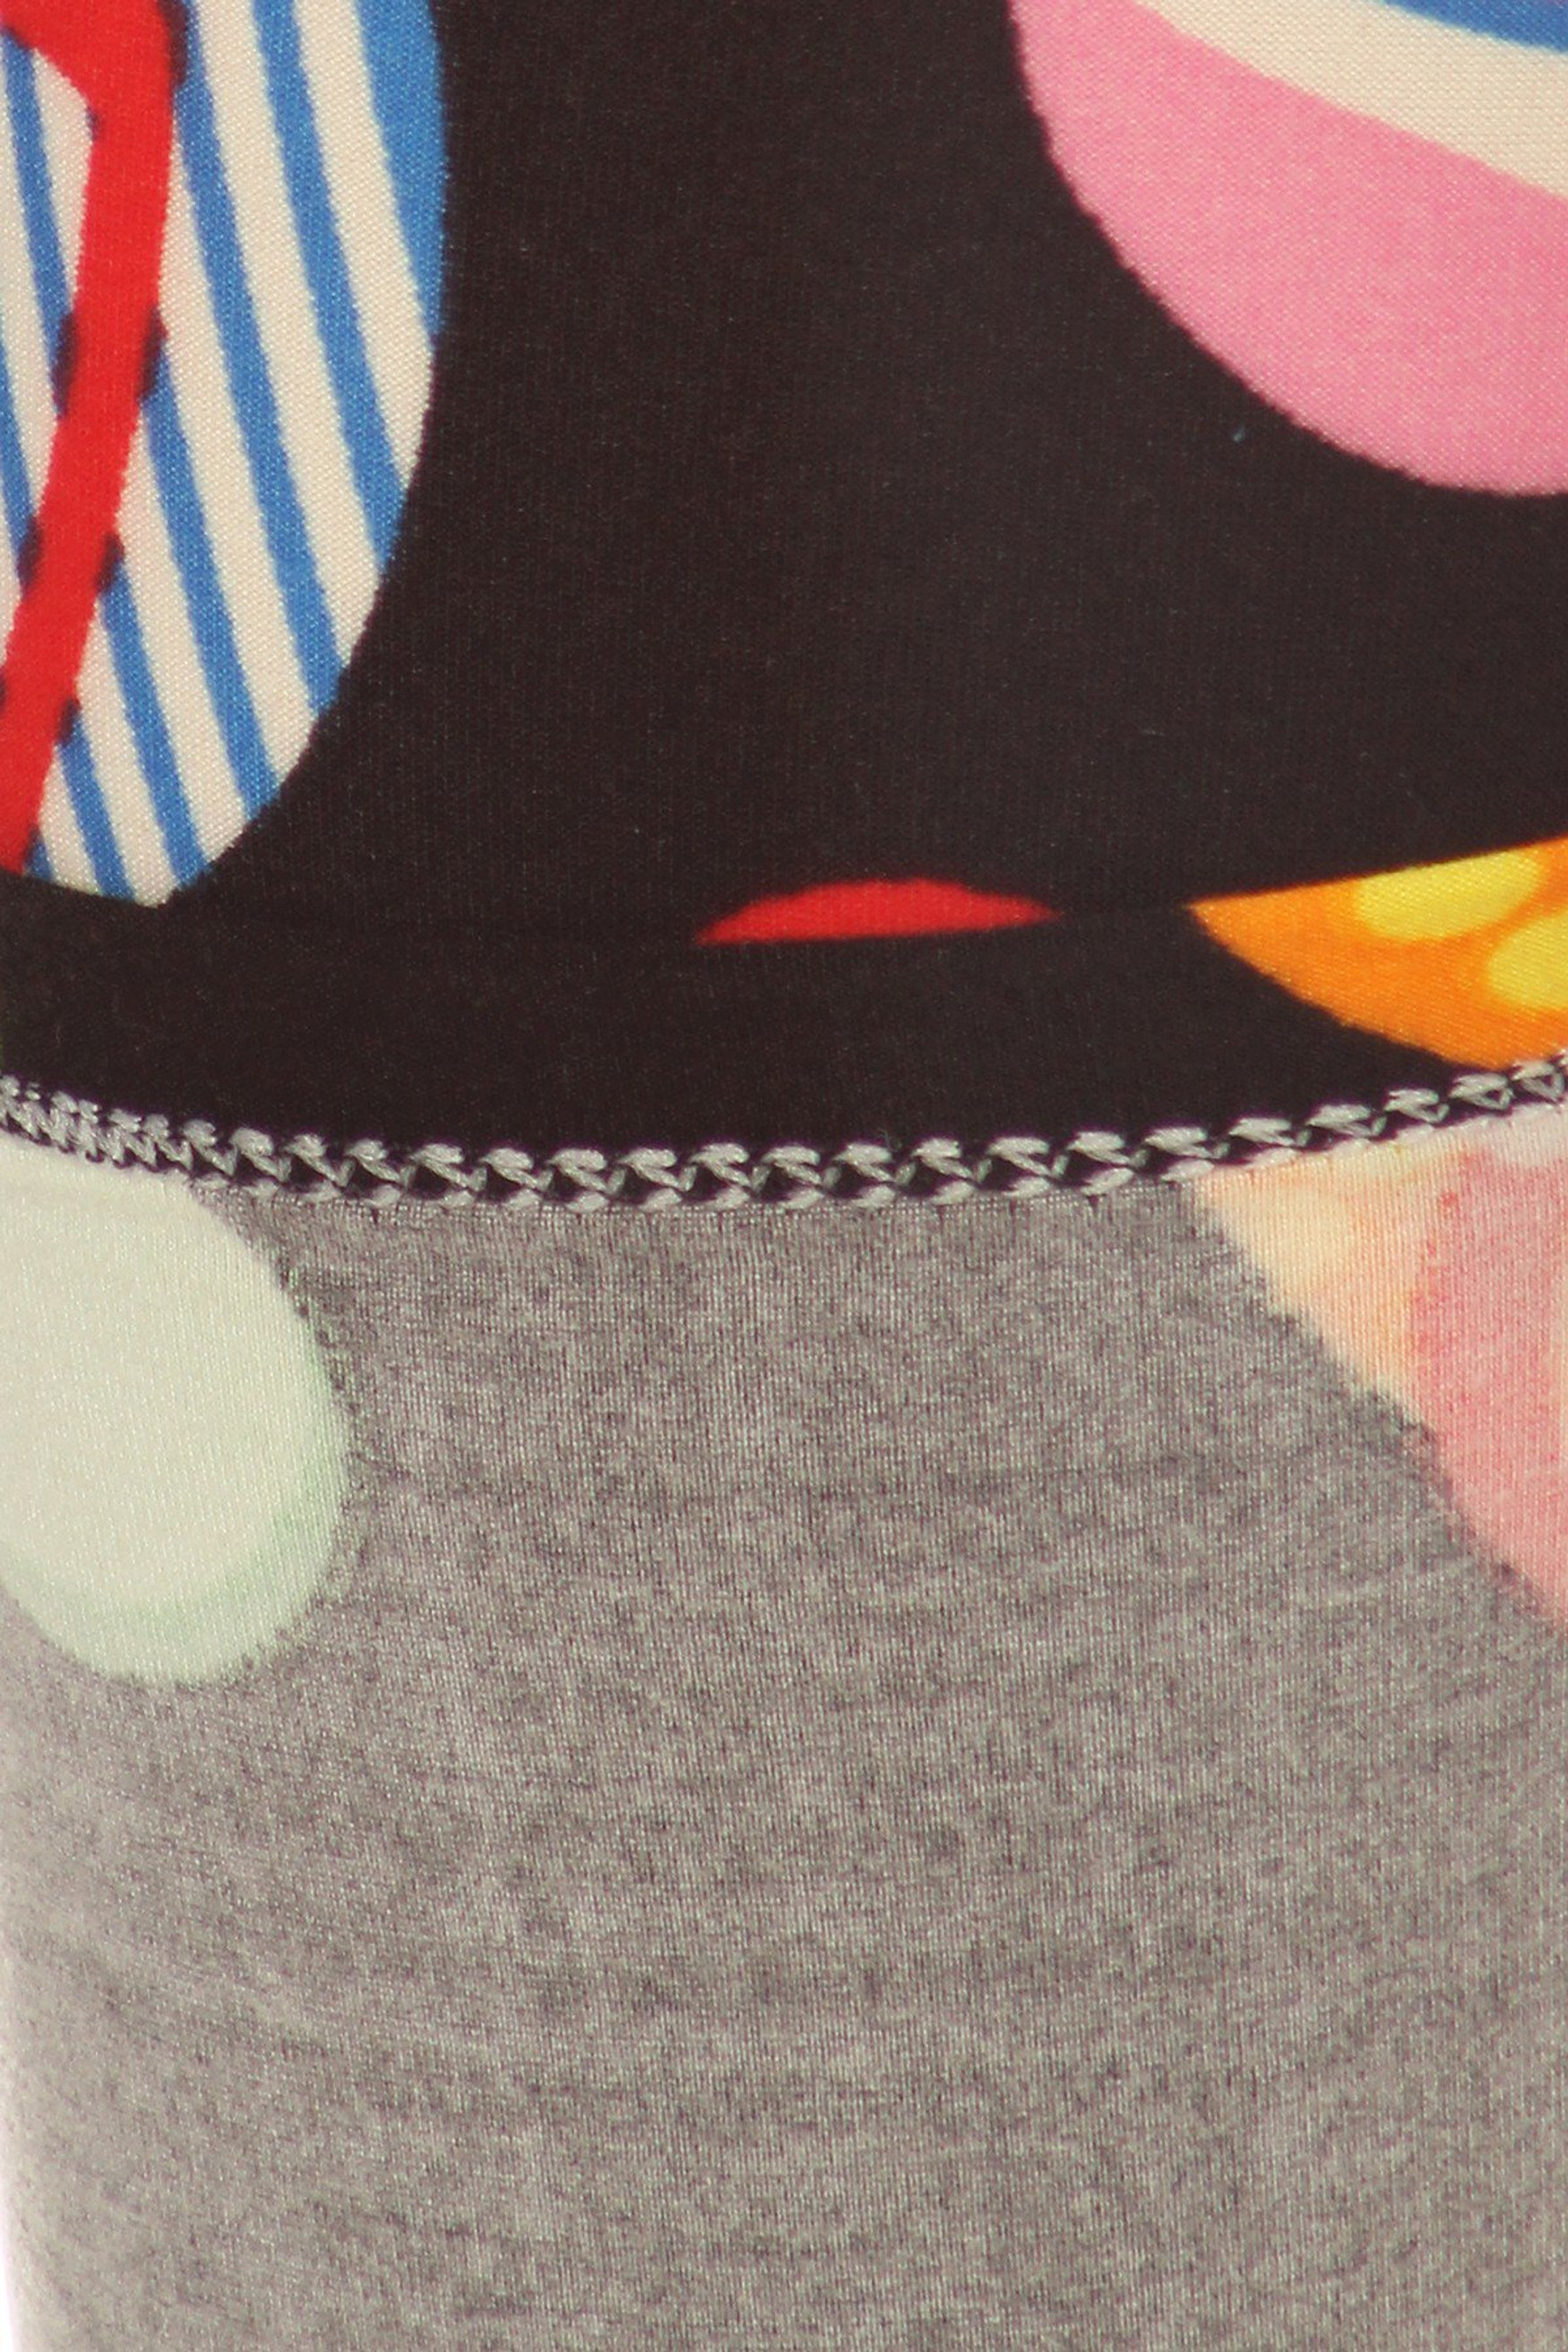 Soft Brushed Jumbo Beach Sandals Leggings - XSmall